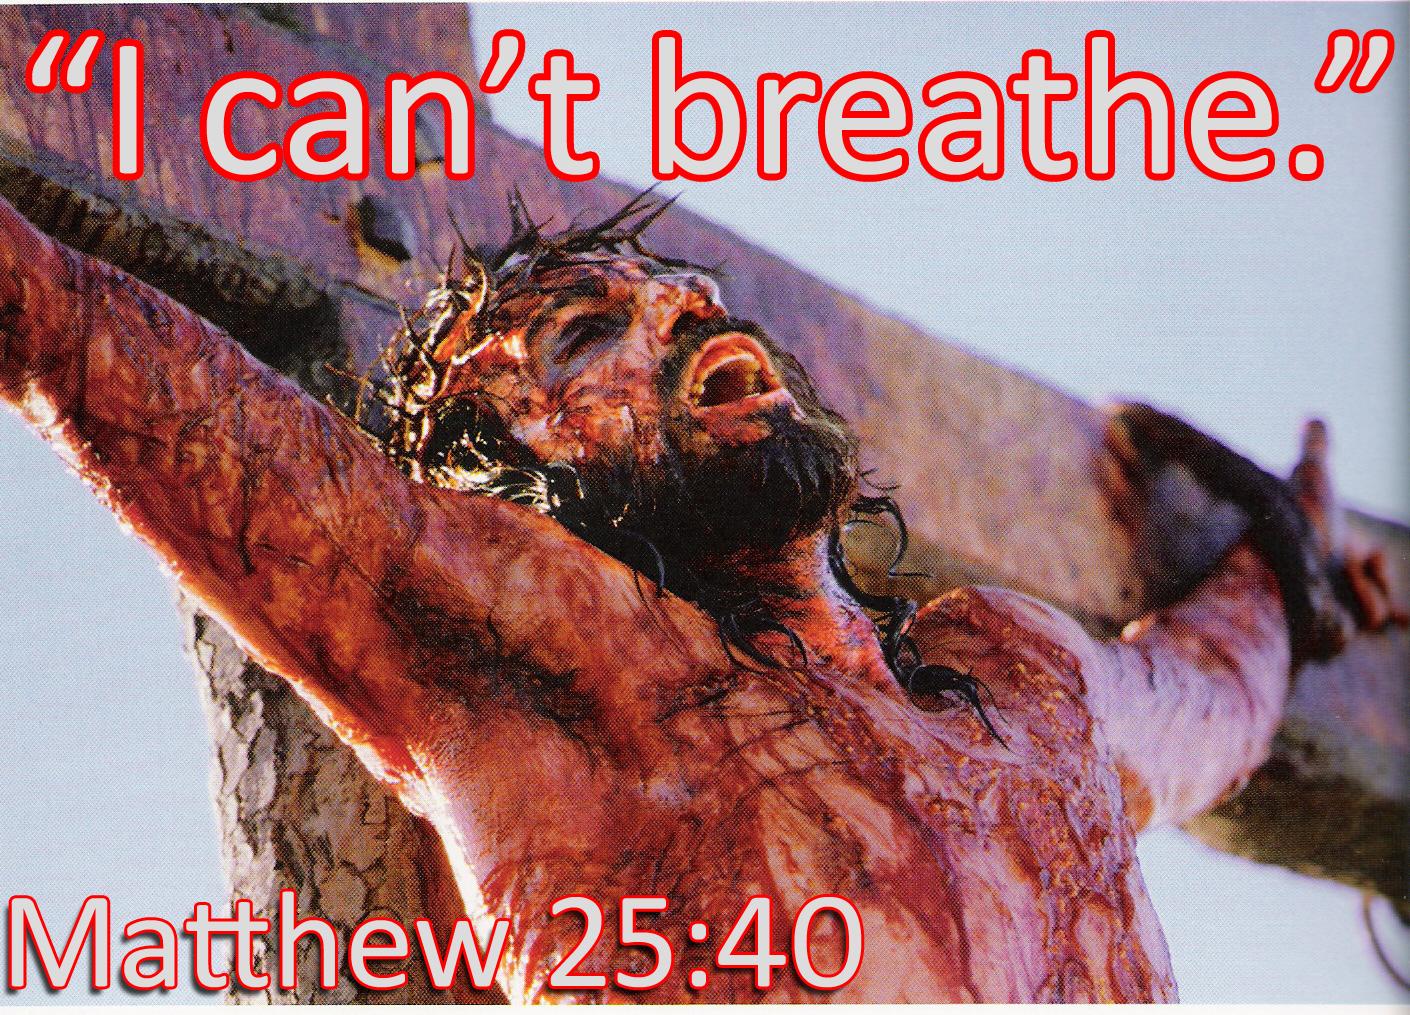 how jesus saves through michael brown and eric garner